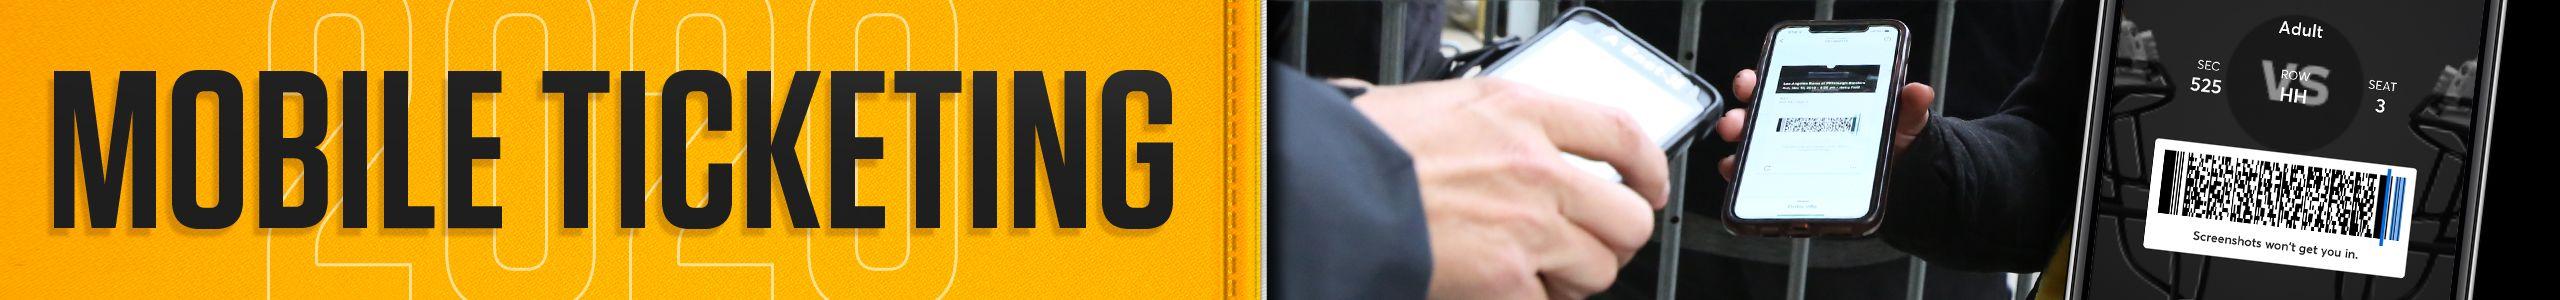 Steelers_MobileTicketPage_Header